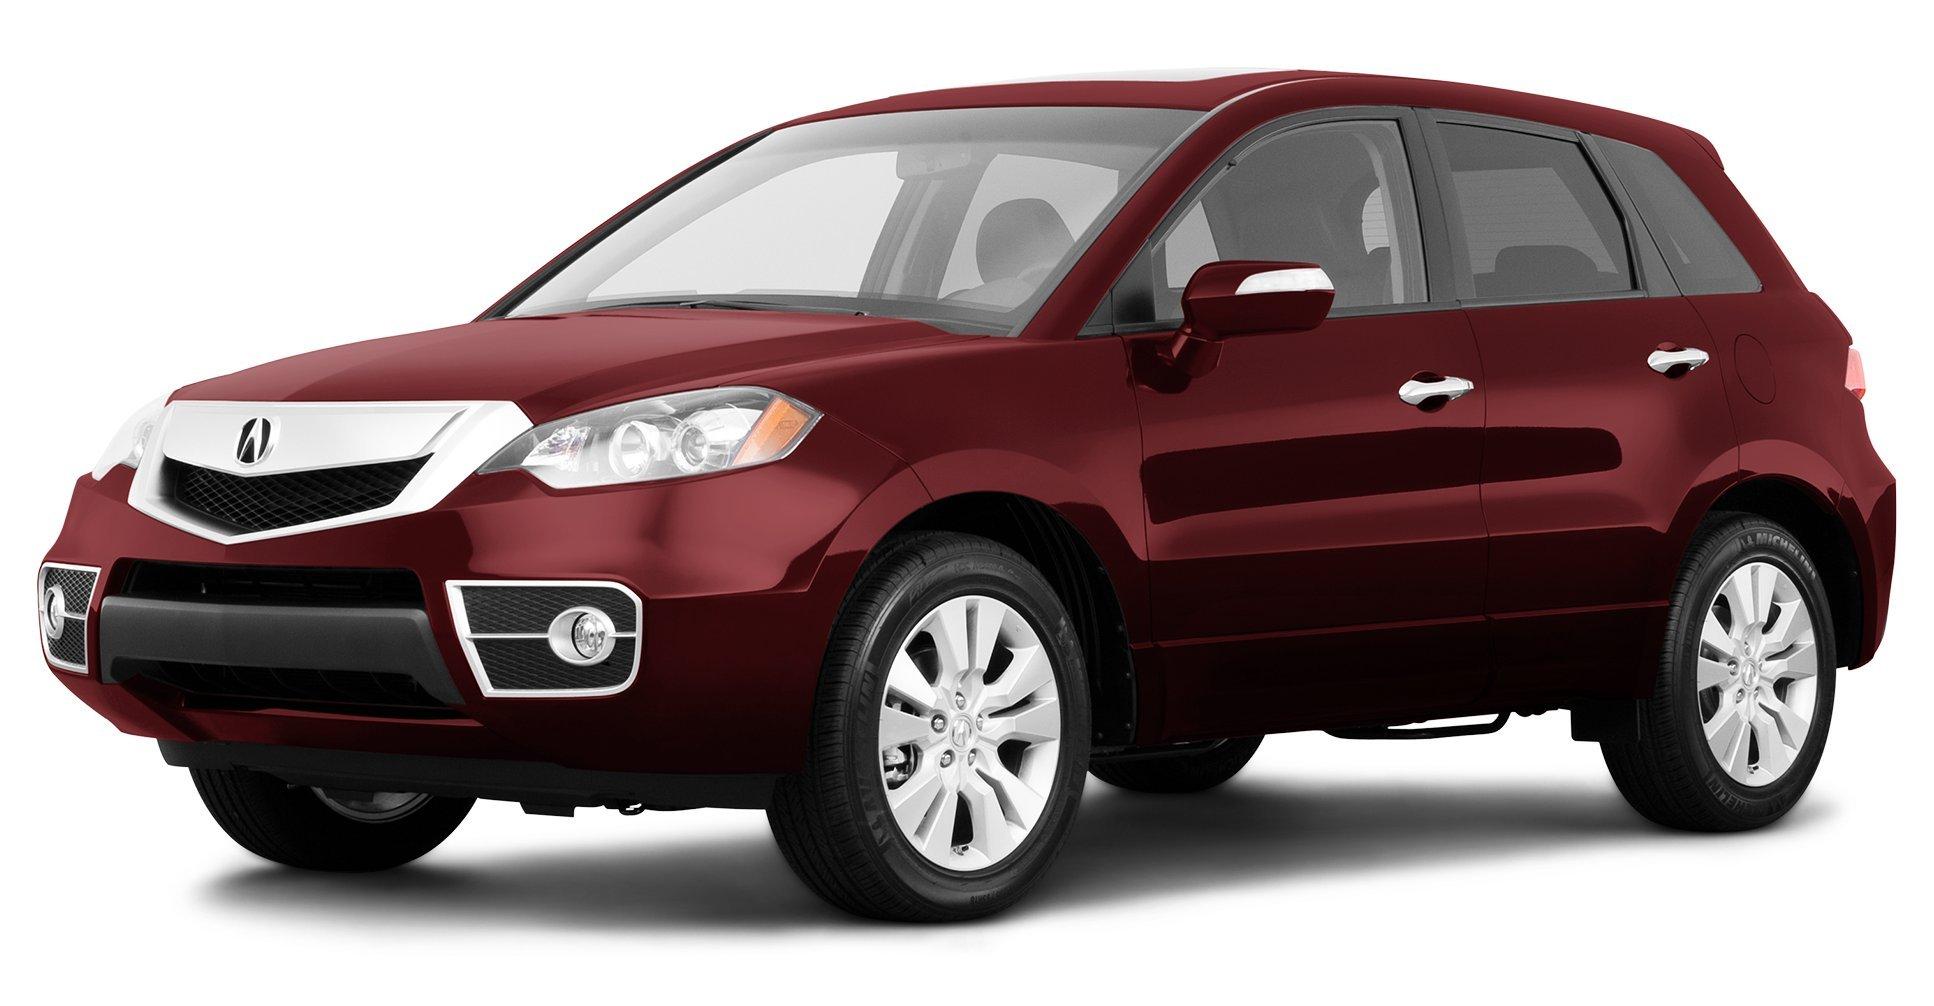 ... 2011 Acura RDX, All Wheel Drive 4-Door